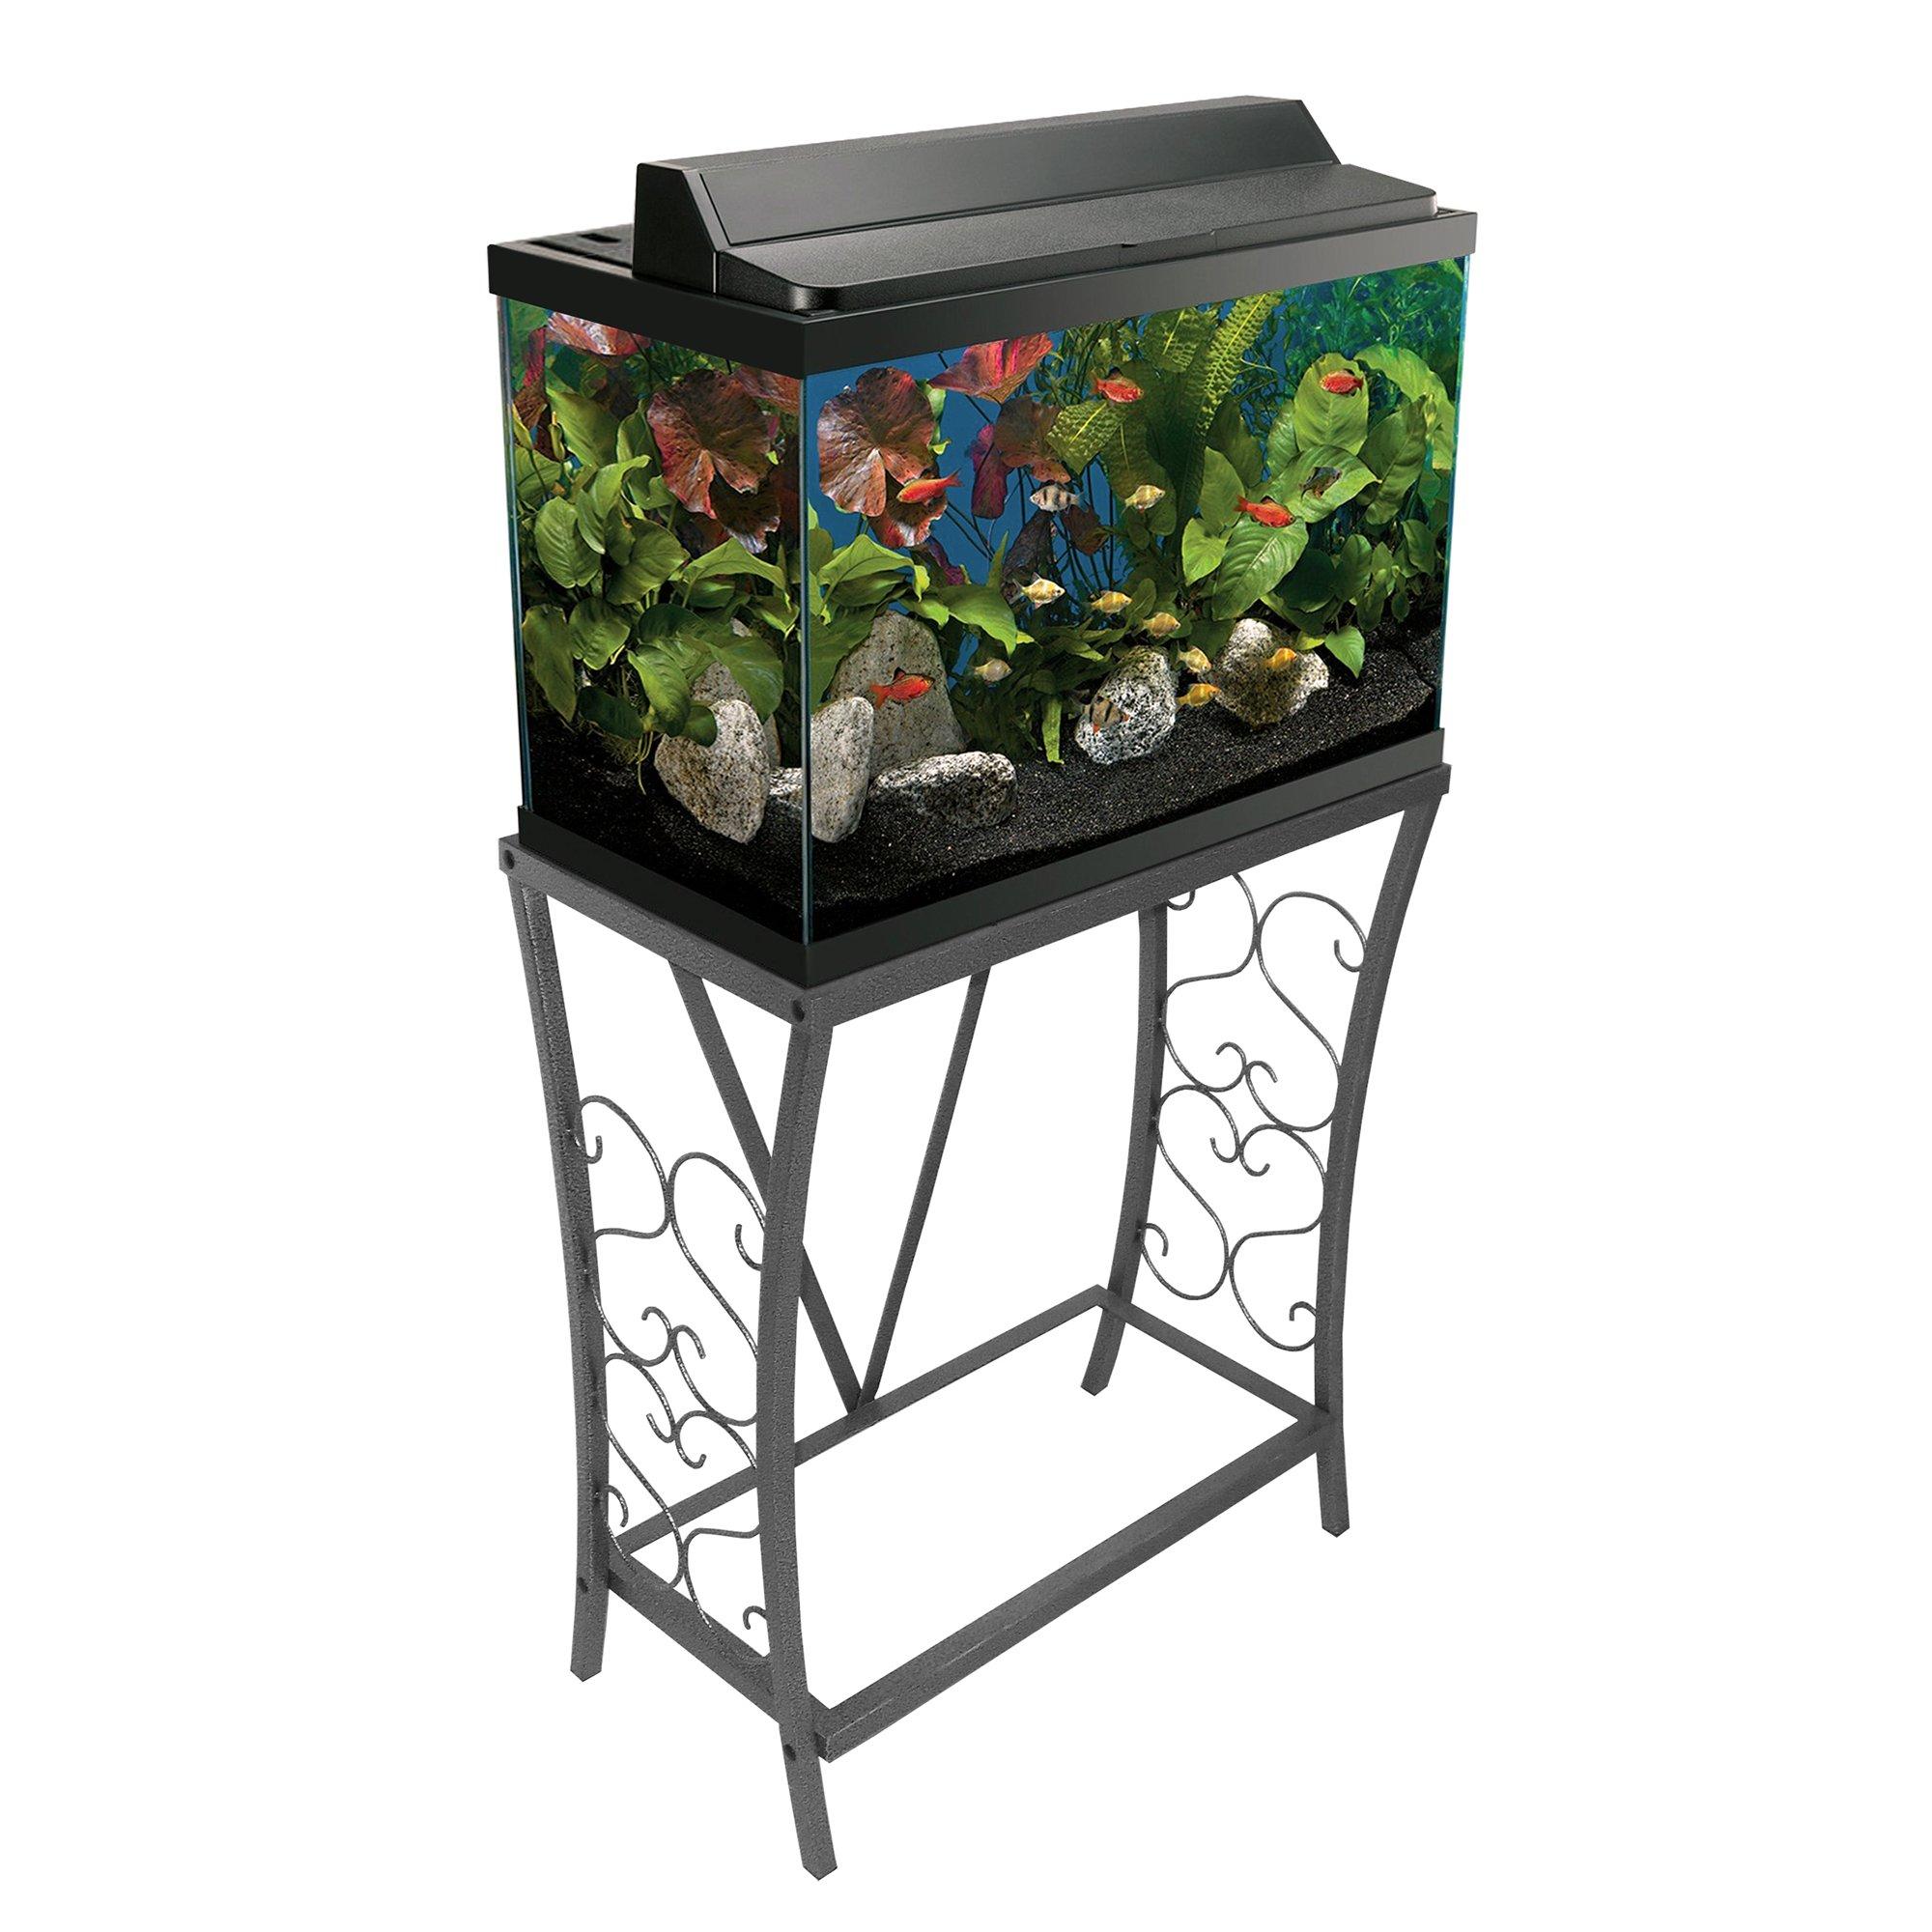 Aquatic fundamentals silver vein scroll aquarium stand 20 for 15 gallon fish tank stand